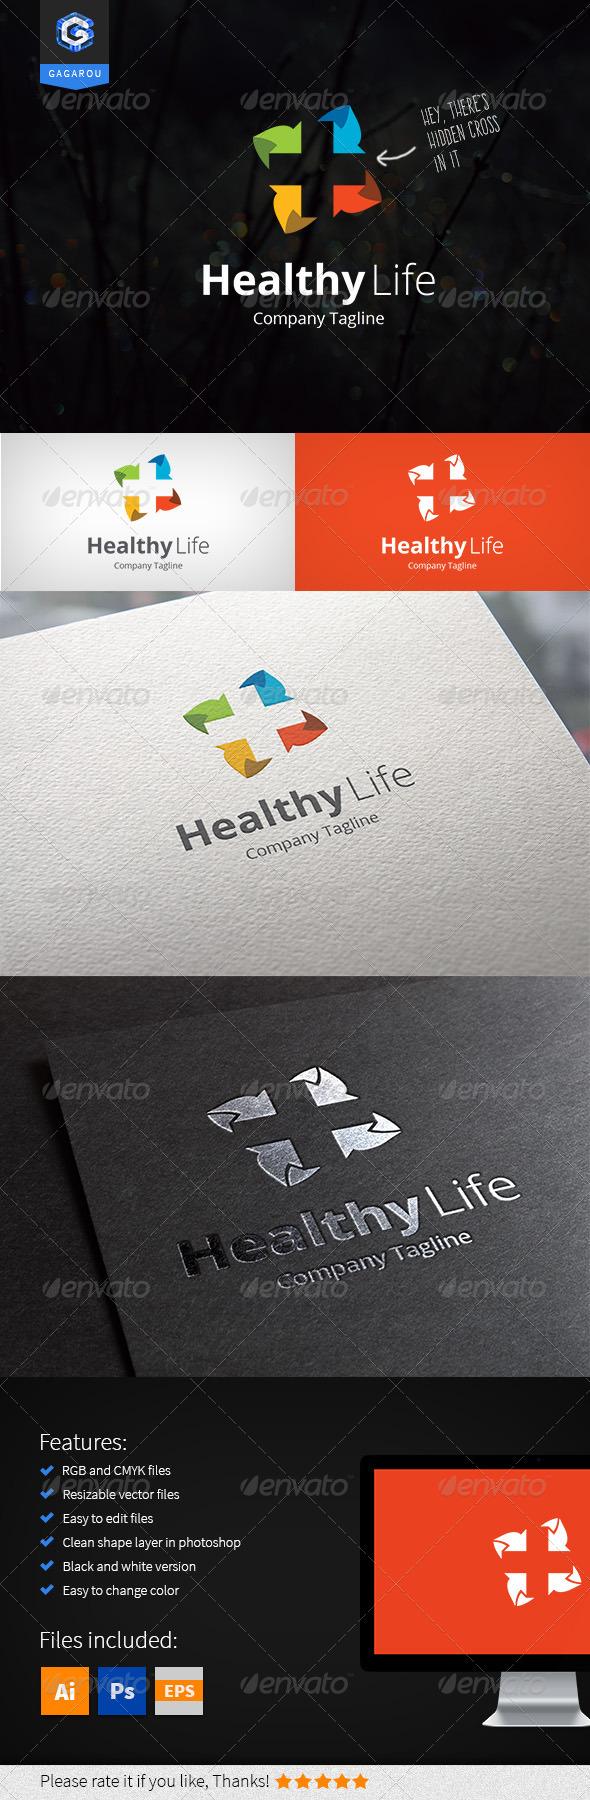 GraphicRiver Healthy Life Logo 8364642